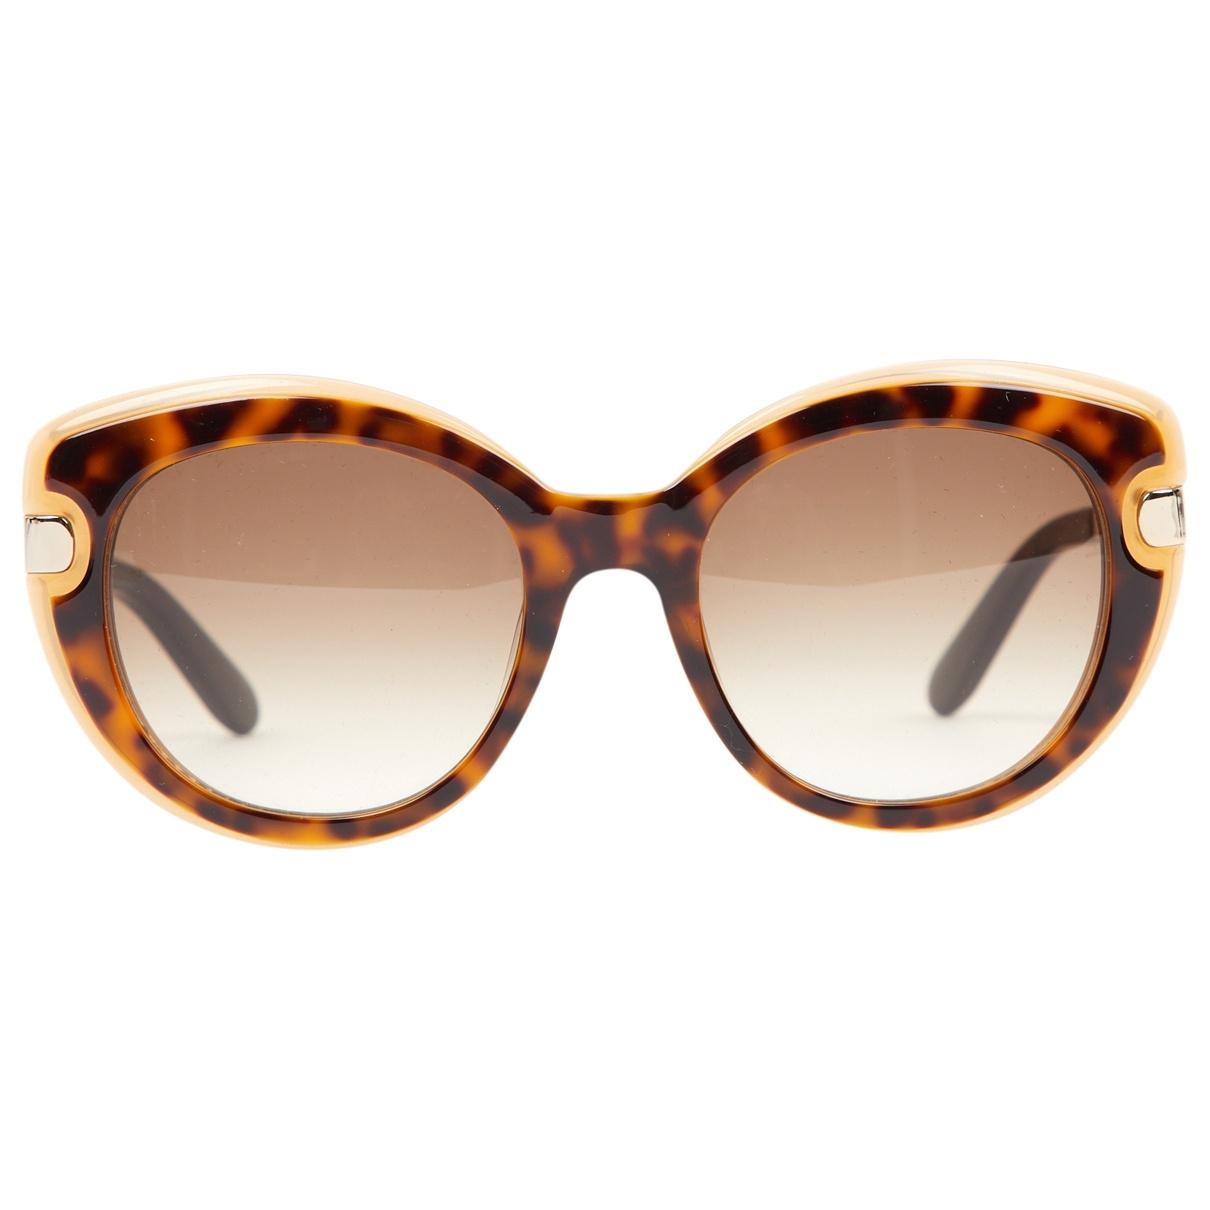 Salvatore Ferragamo \N Camel Sunglasses for Women \N